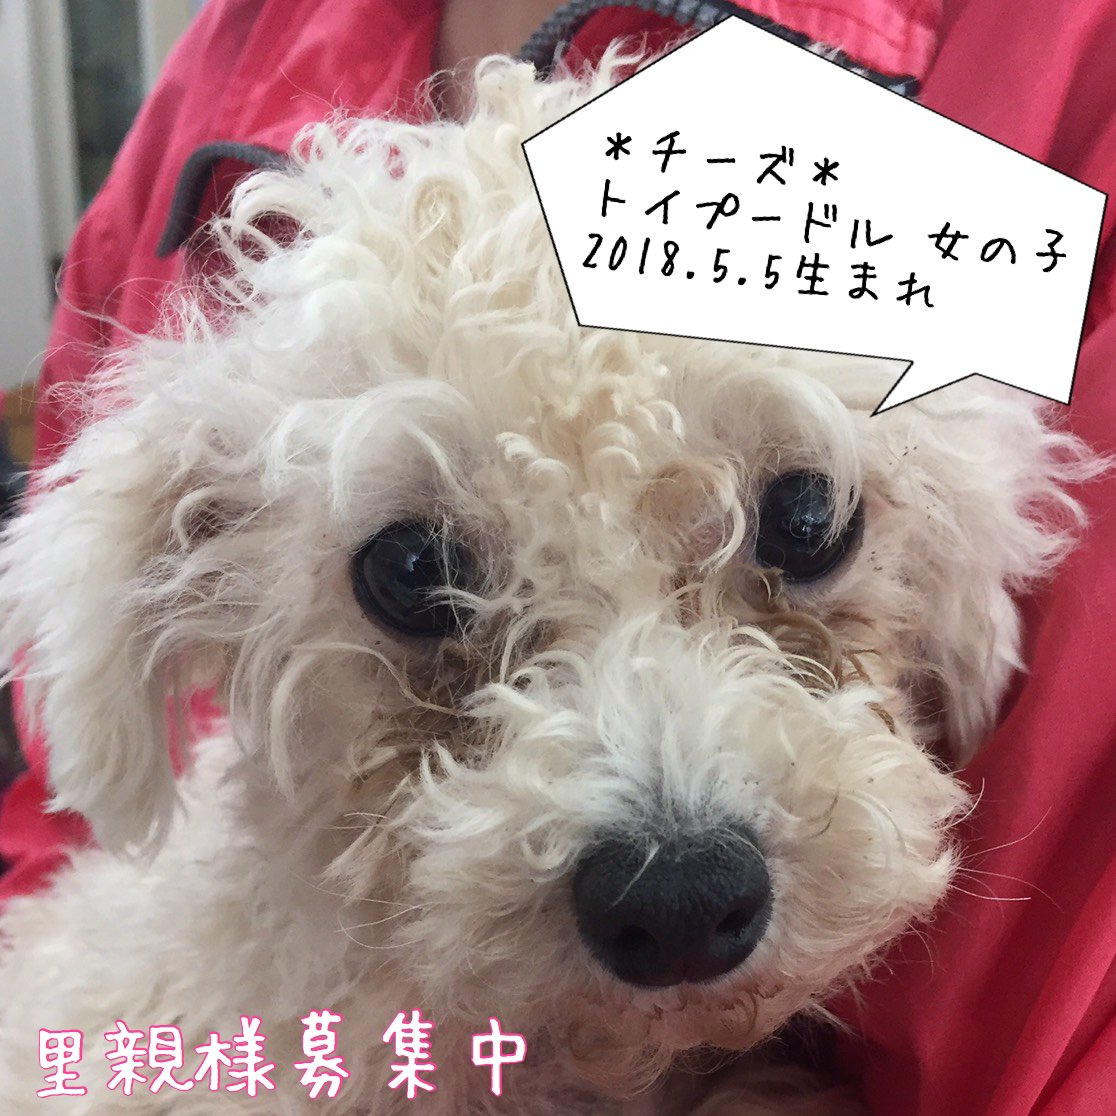 保護犬カフェ 鶴橋店 S Tweet 里親様募集中 本日保護の